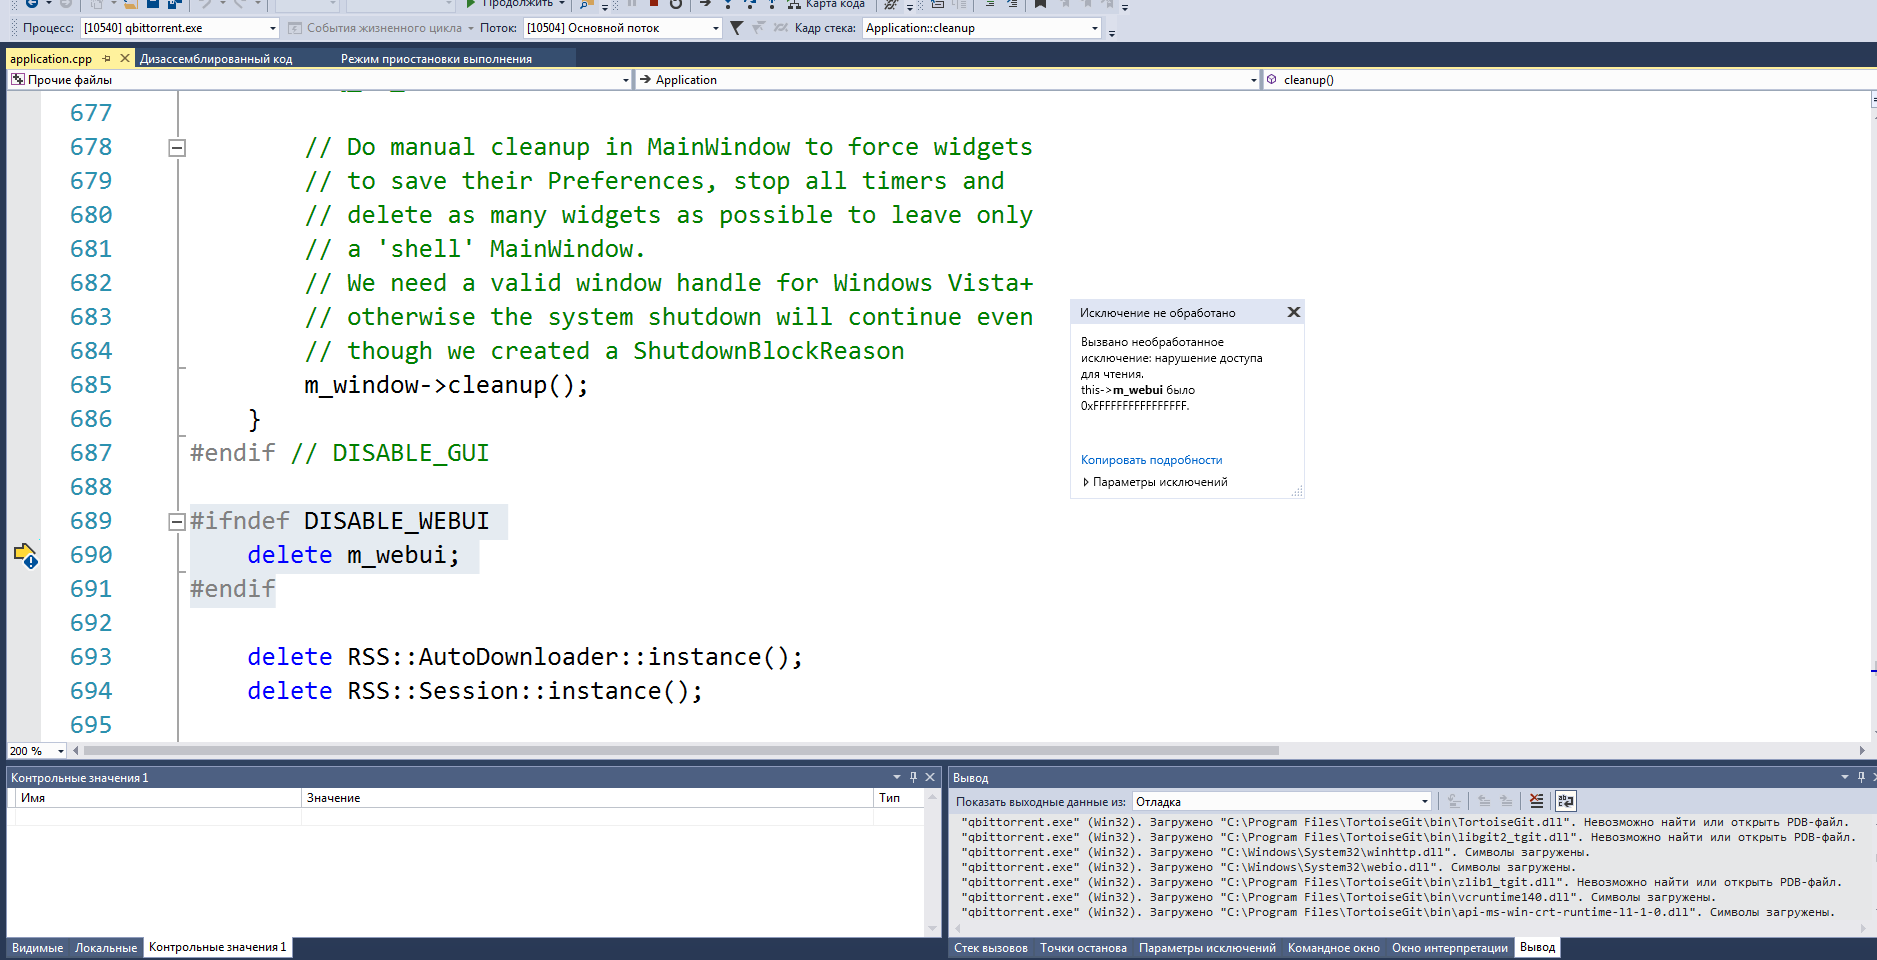 qBittorrent v4 0 0 have AV (Access Violation) after close